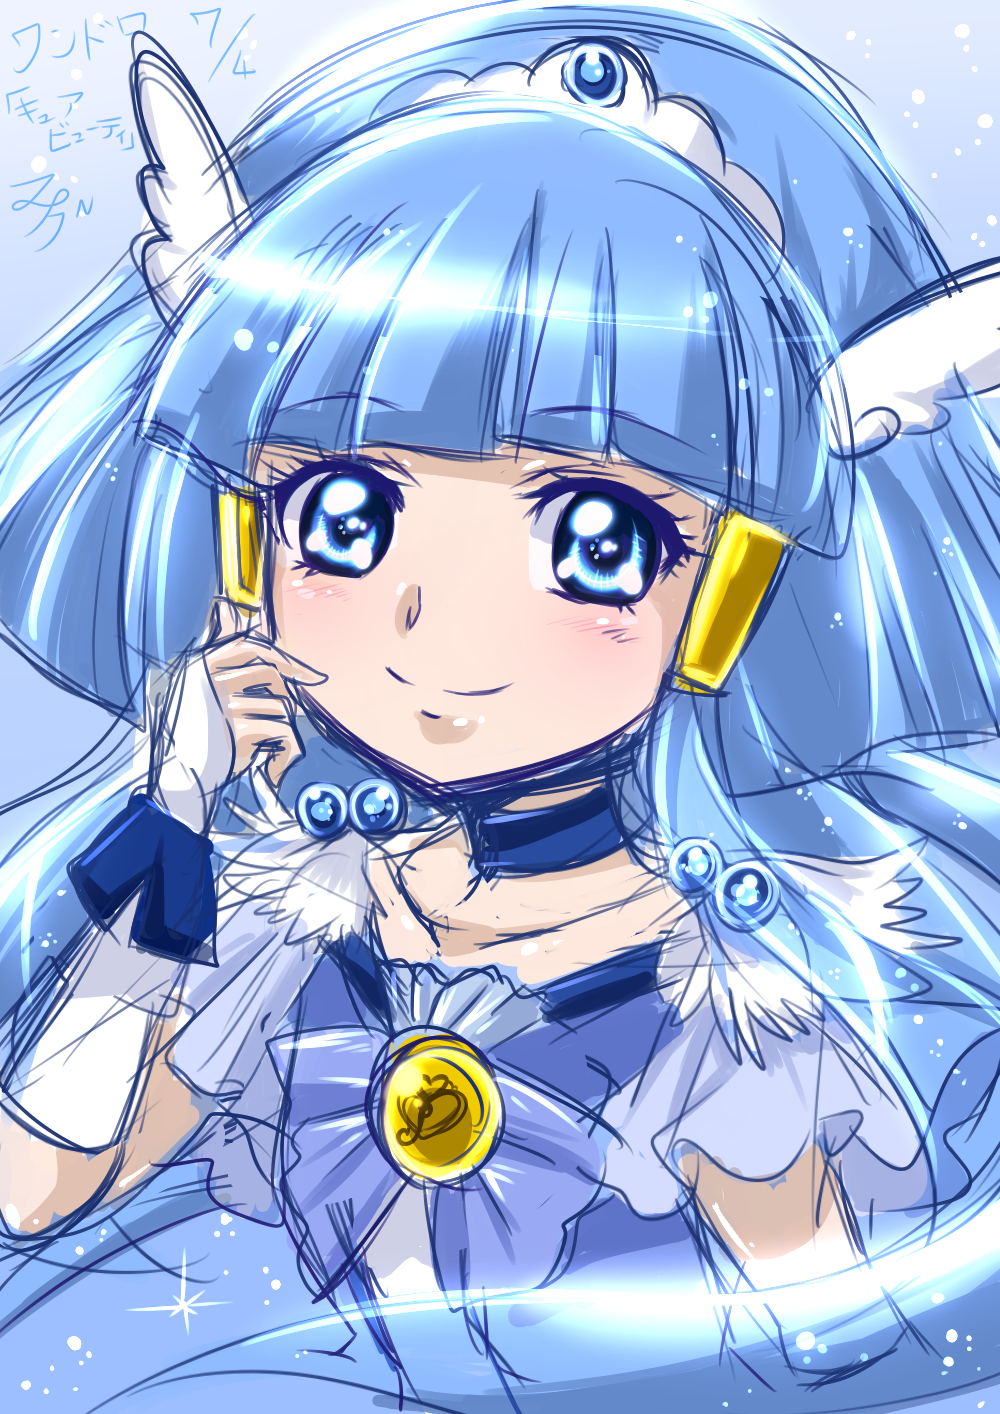 Glitterforce Glitter Force Characters Magical Girl Anime Glitter Force